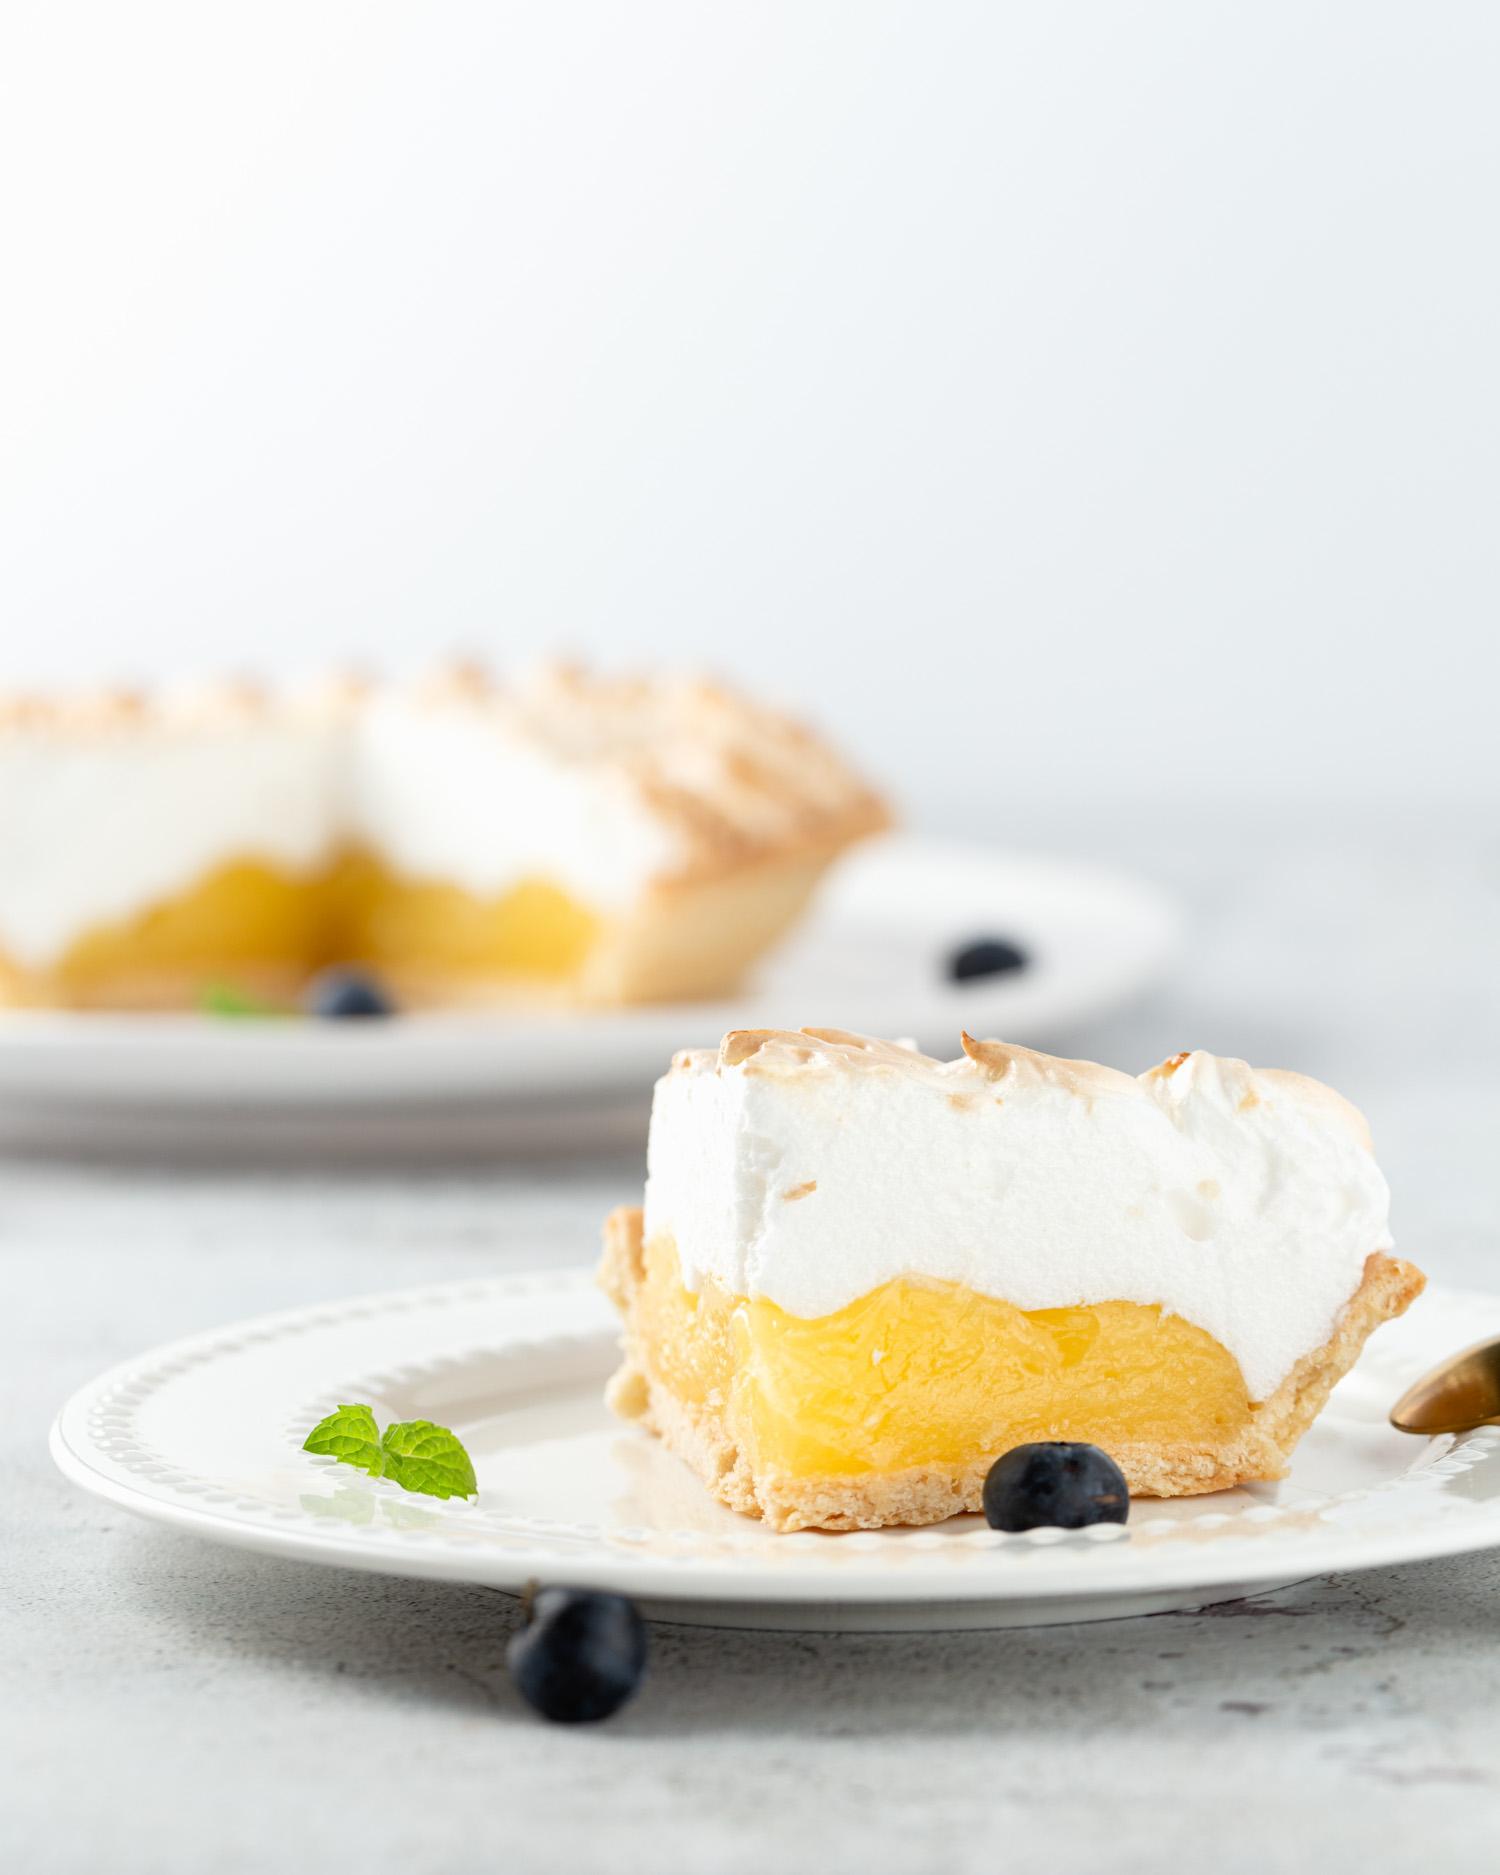 Lemon tart, tarte citron in Paris